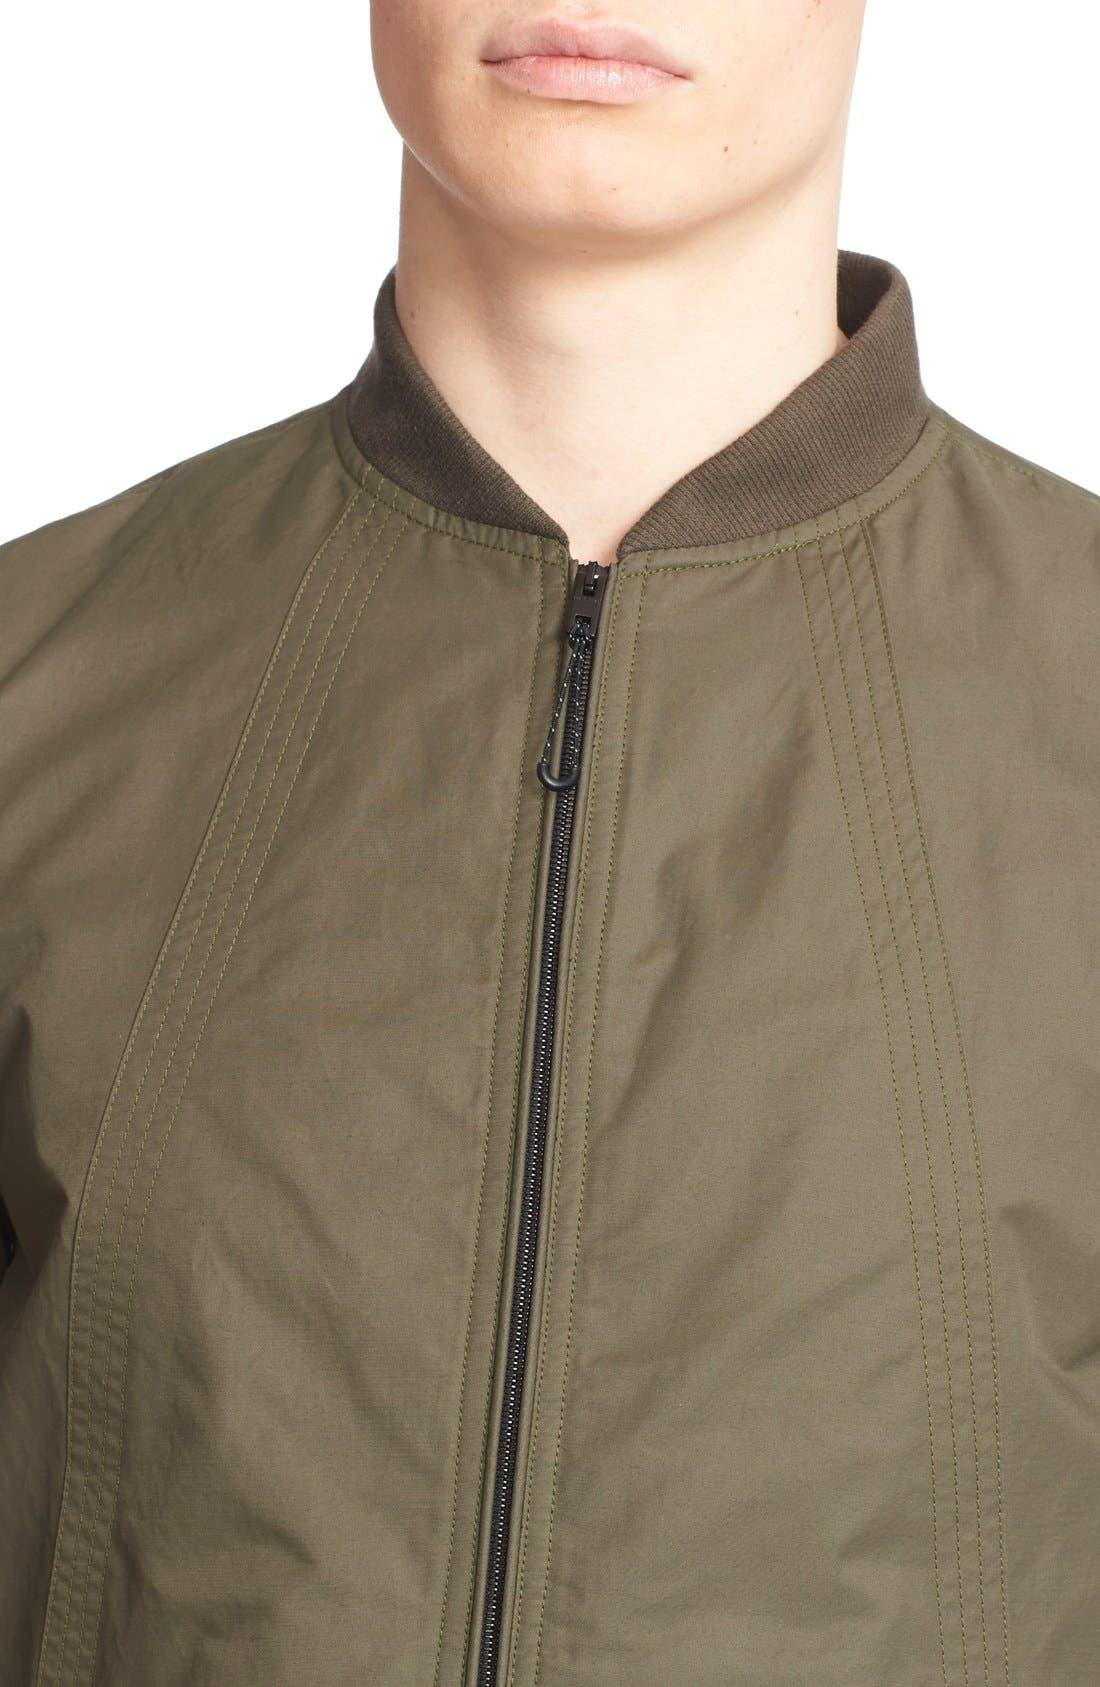 'Depot' Jacket,                             Alternate thumbnail 2, color,                             315